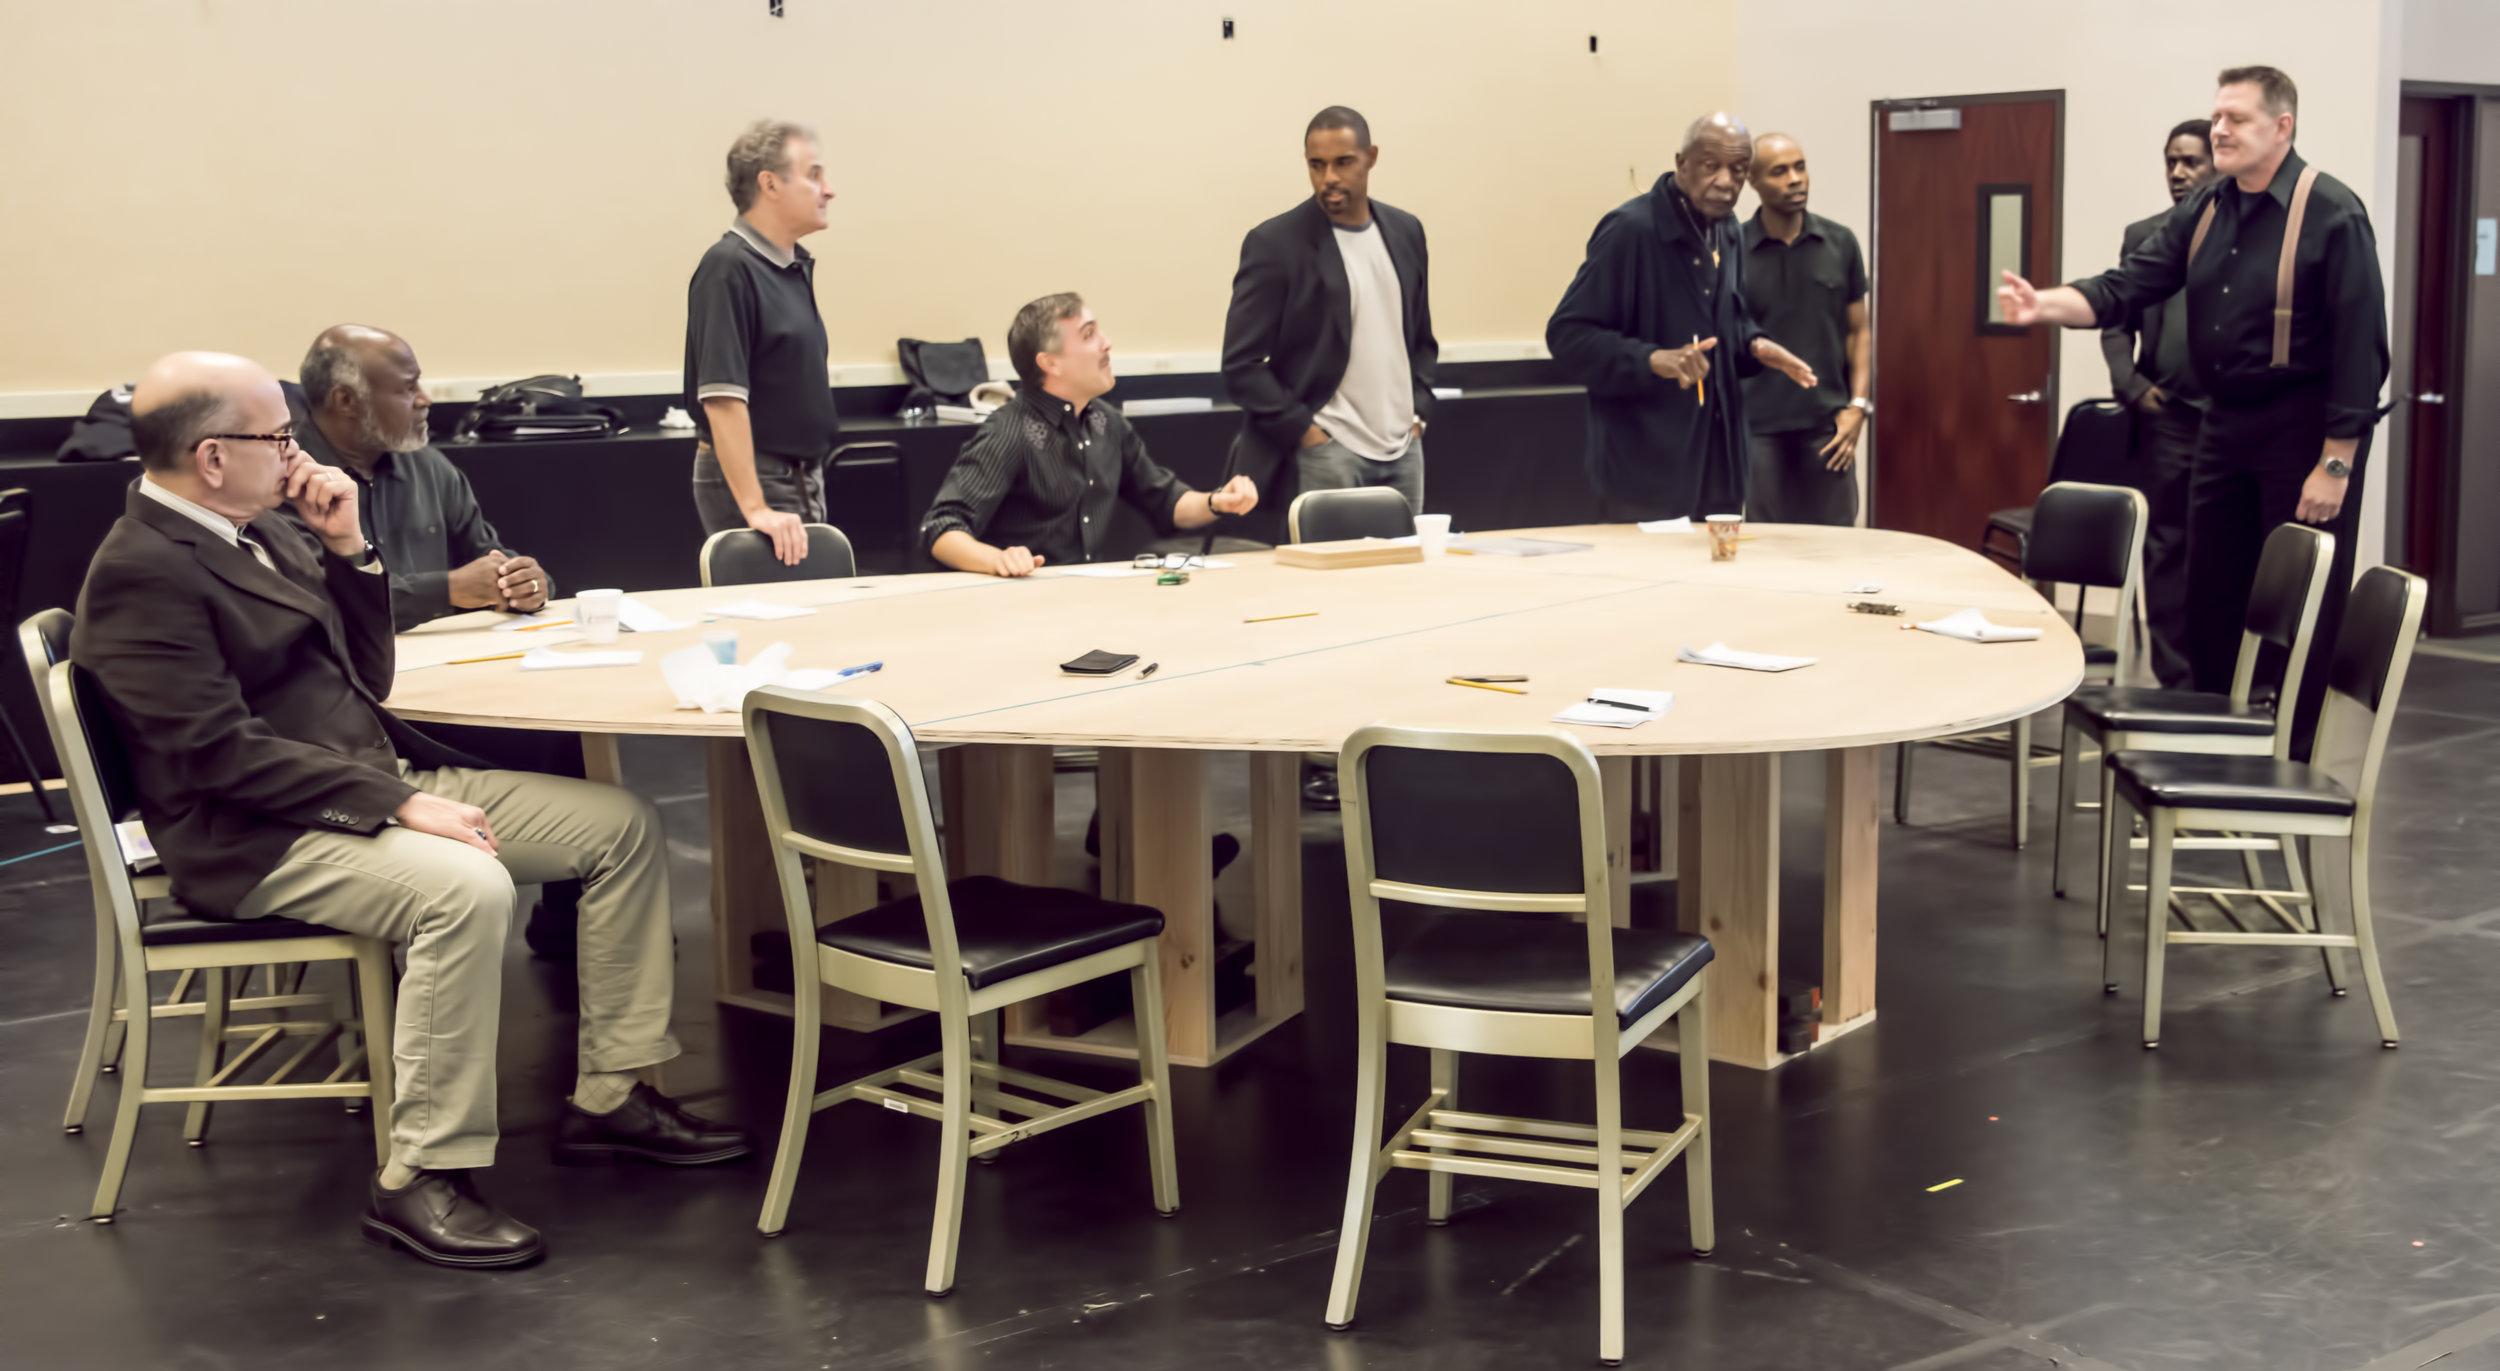 The Cast in rehearsal.  L to R Robert Picardo, Ellis Williams, Barry Pearl, Scott, Jason George, Adoplhus Ward, Jacques Smith, Clinton Derricks-Carroll, Greg North